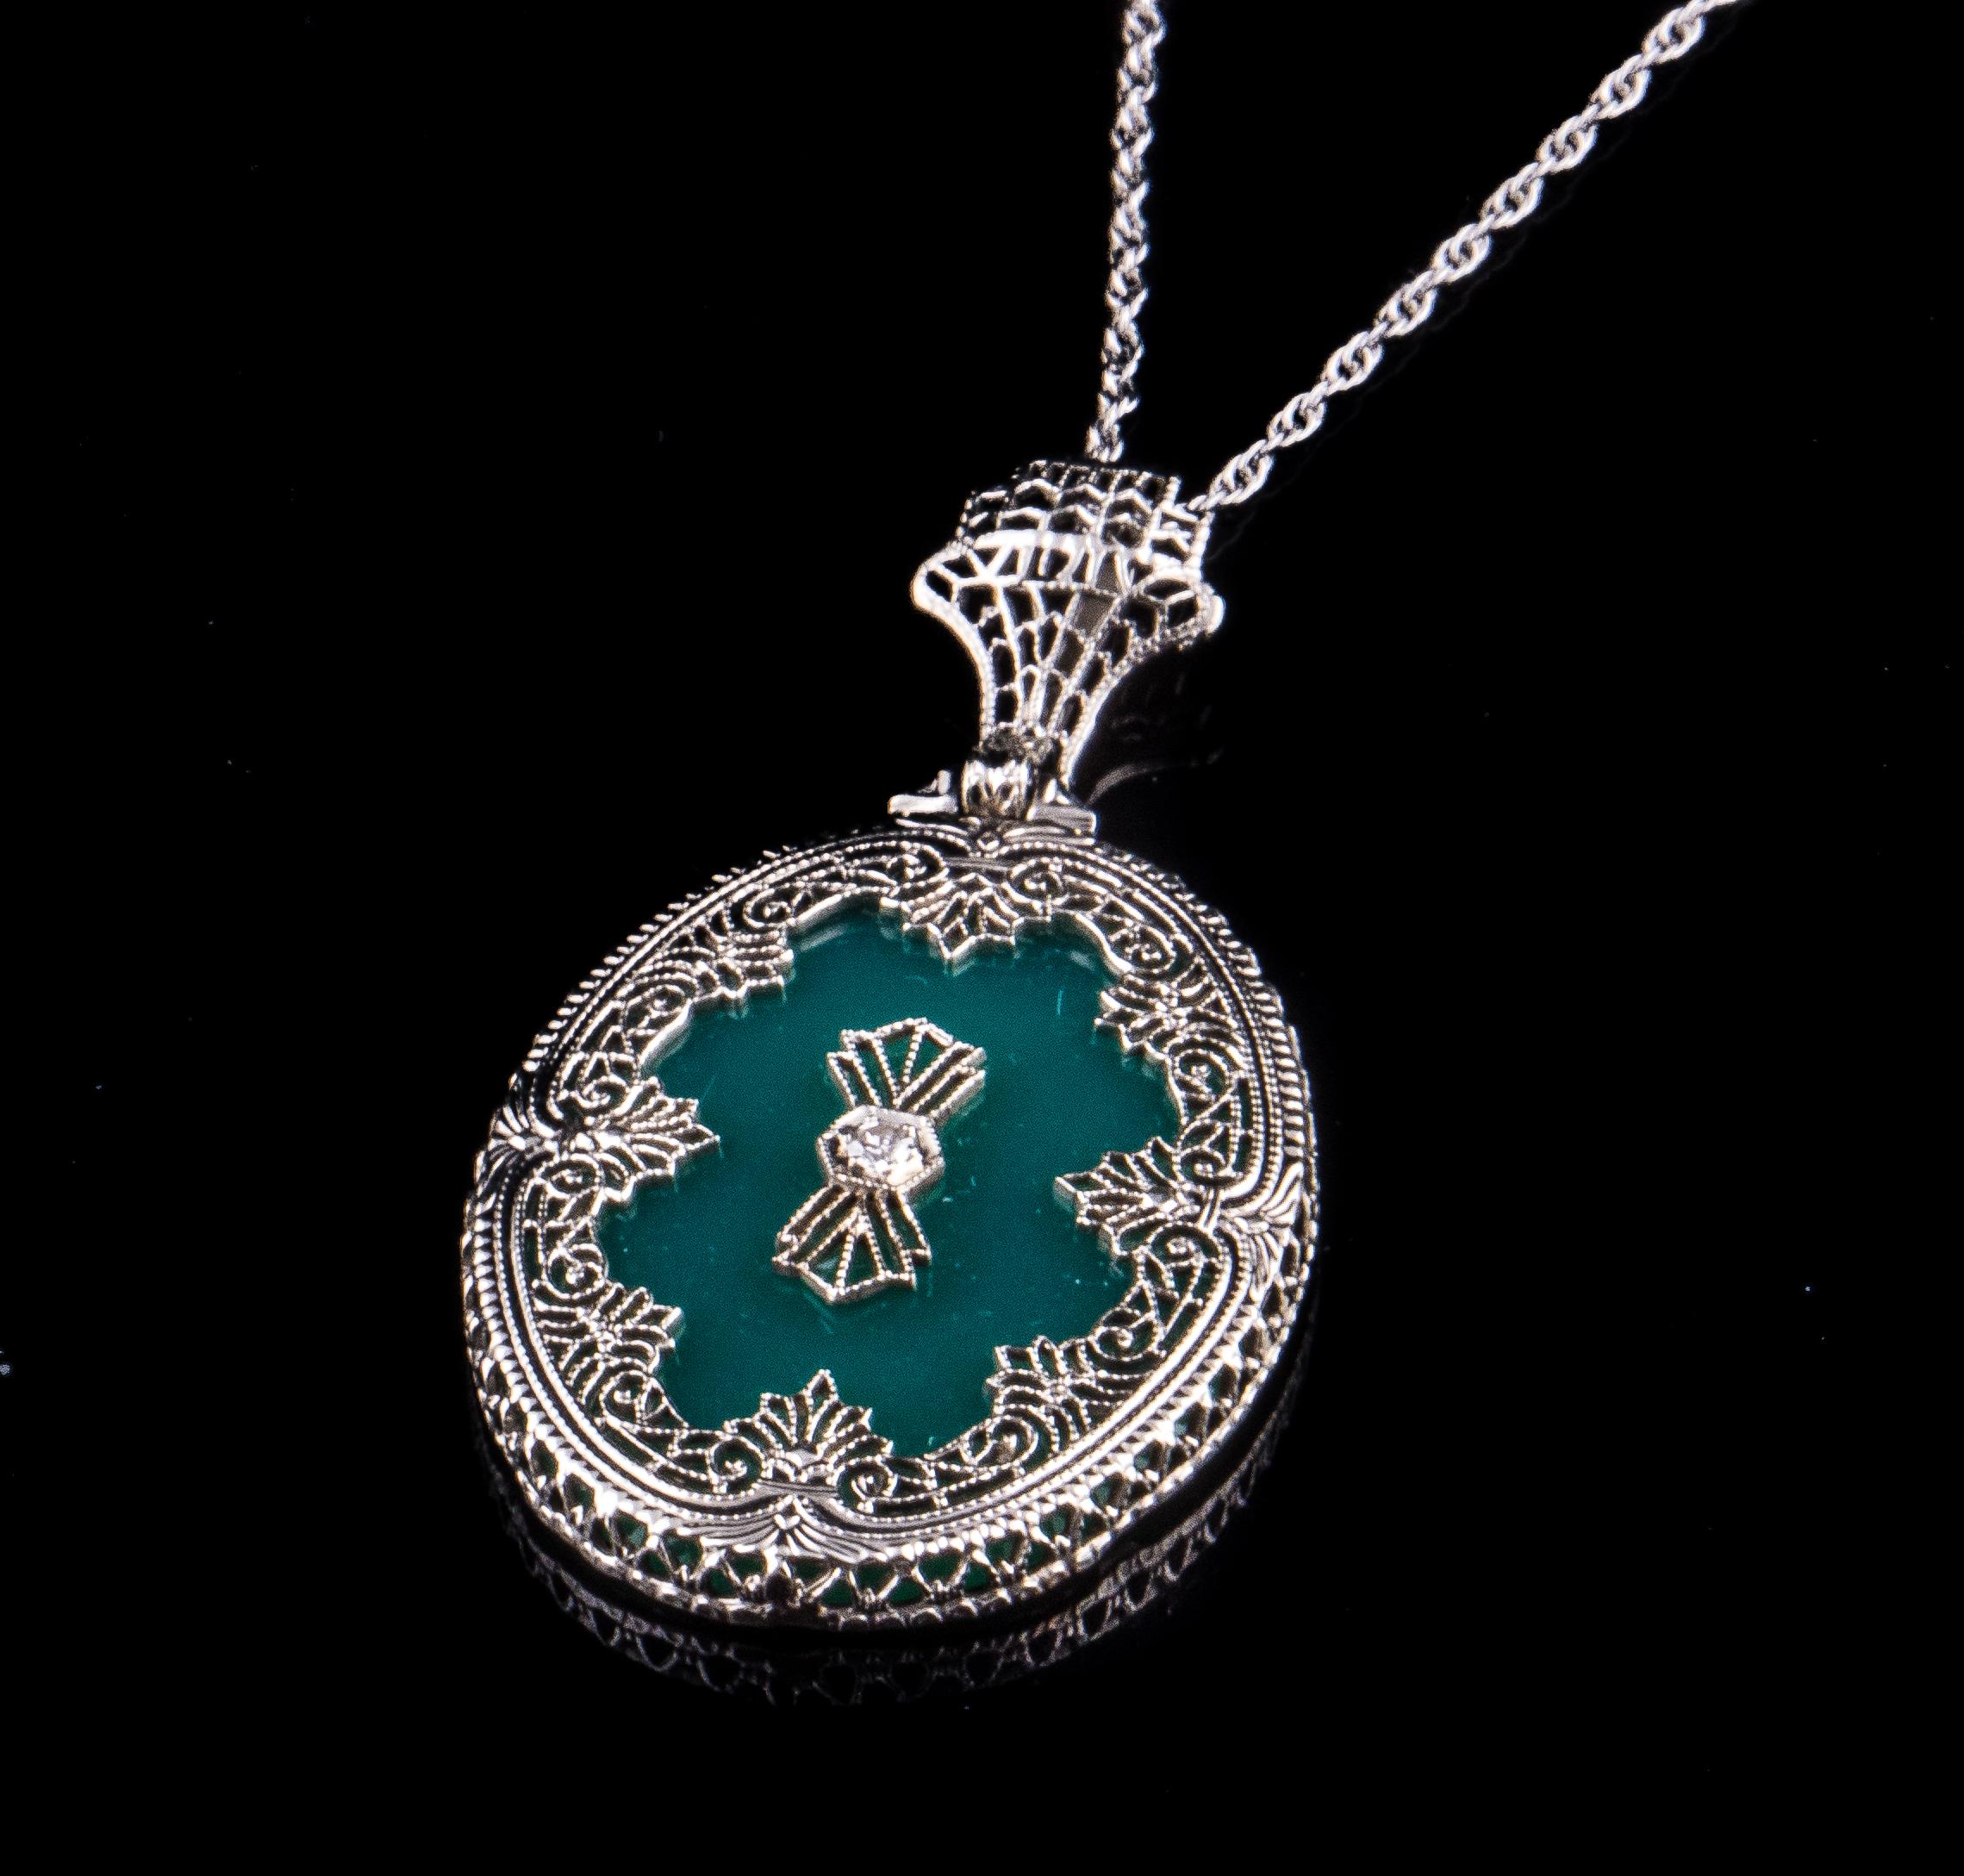 10kt Art Deco green onyx filigree necklace